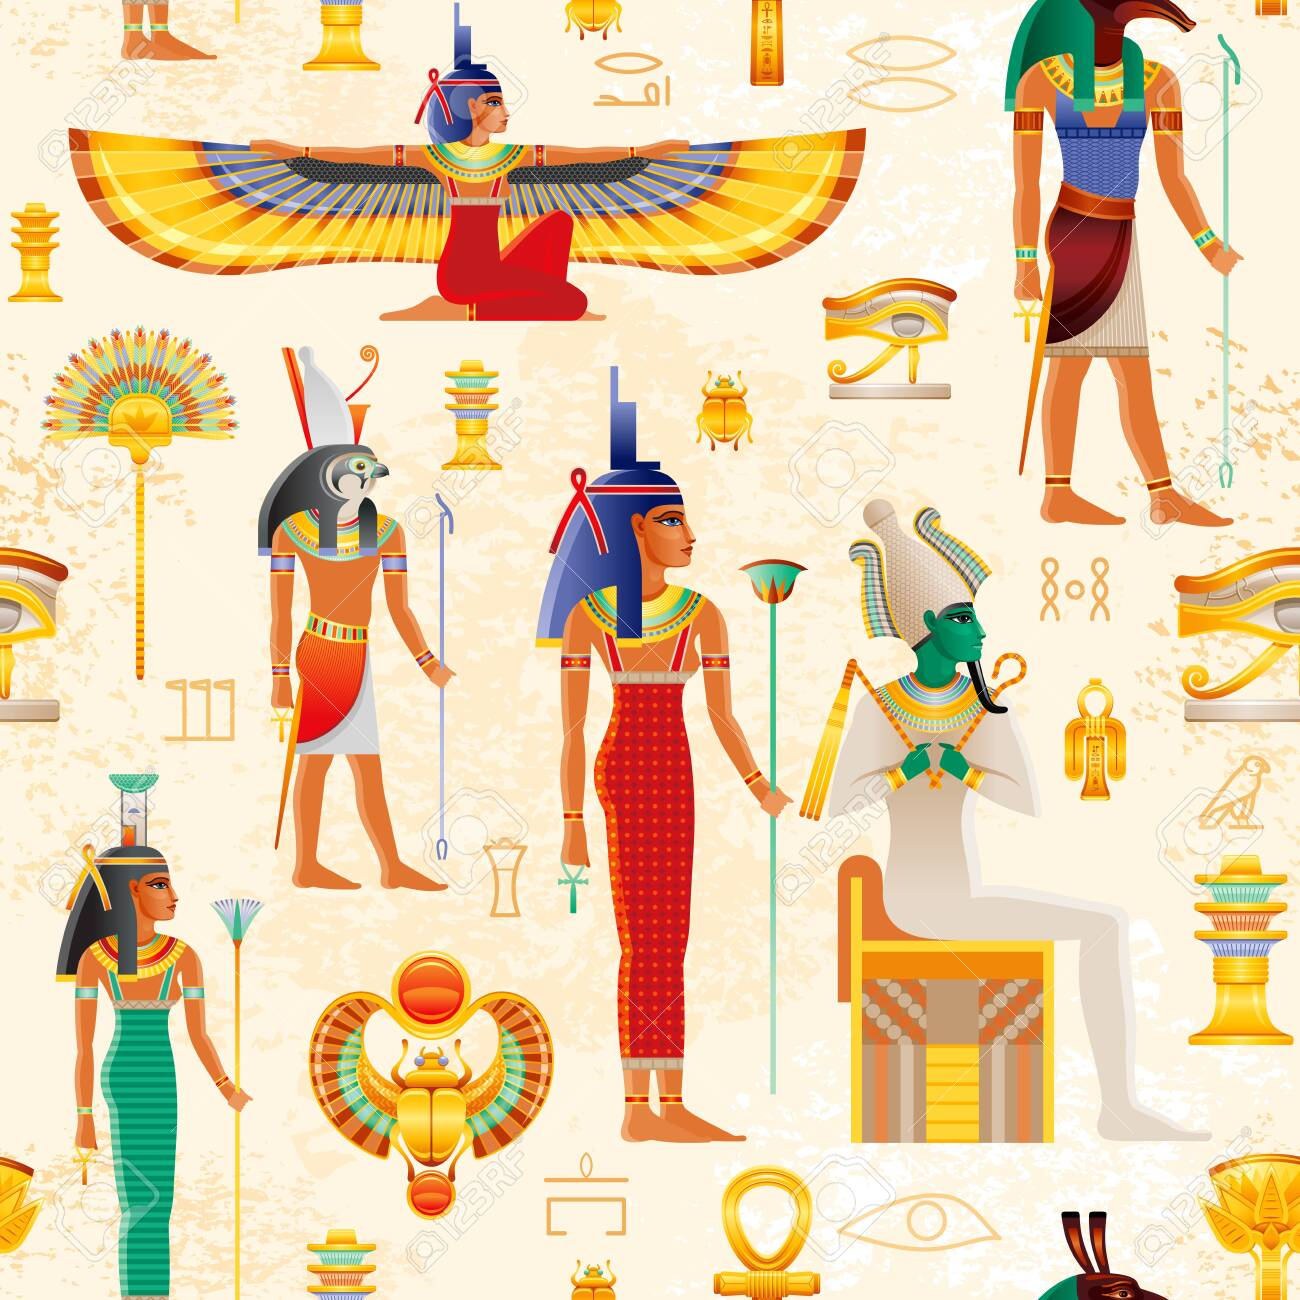 Egyptian vector seamless papyrus pattern with Osiris myth characters - god Osiris, Set, Horus, goddess Isis, Nephthys, pharaoh element - Ankh, Scarab, Tyet, eye Wadjet. Ancient historic art form Egypt - 148128374